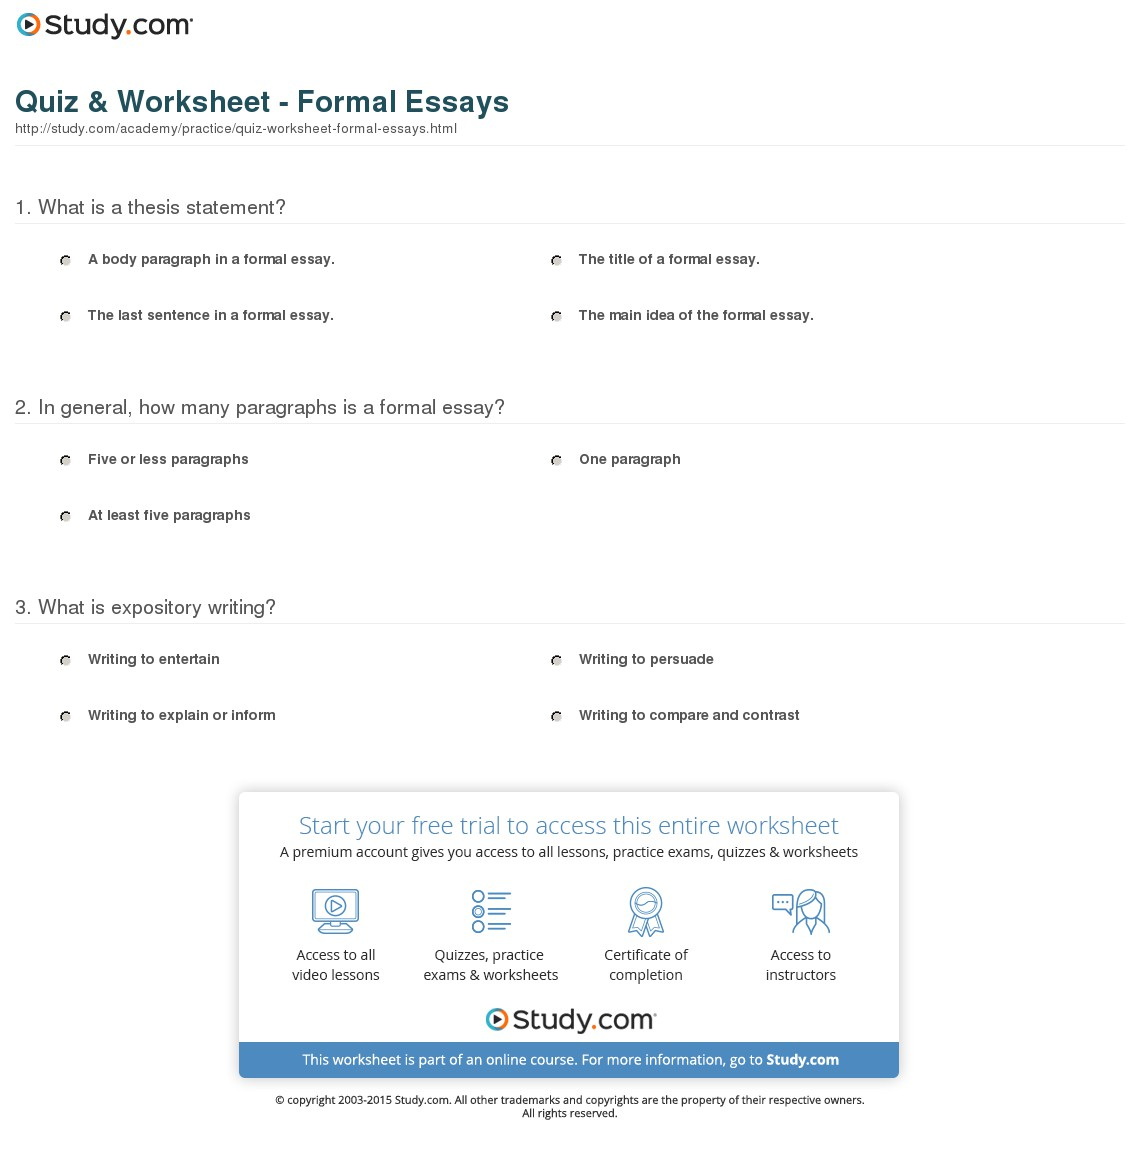 021 Quiz Worksheet Formal Essays Essay Example What Is